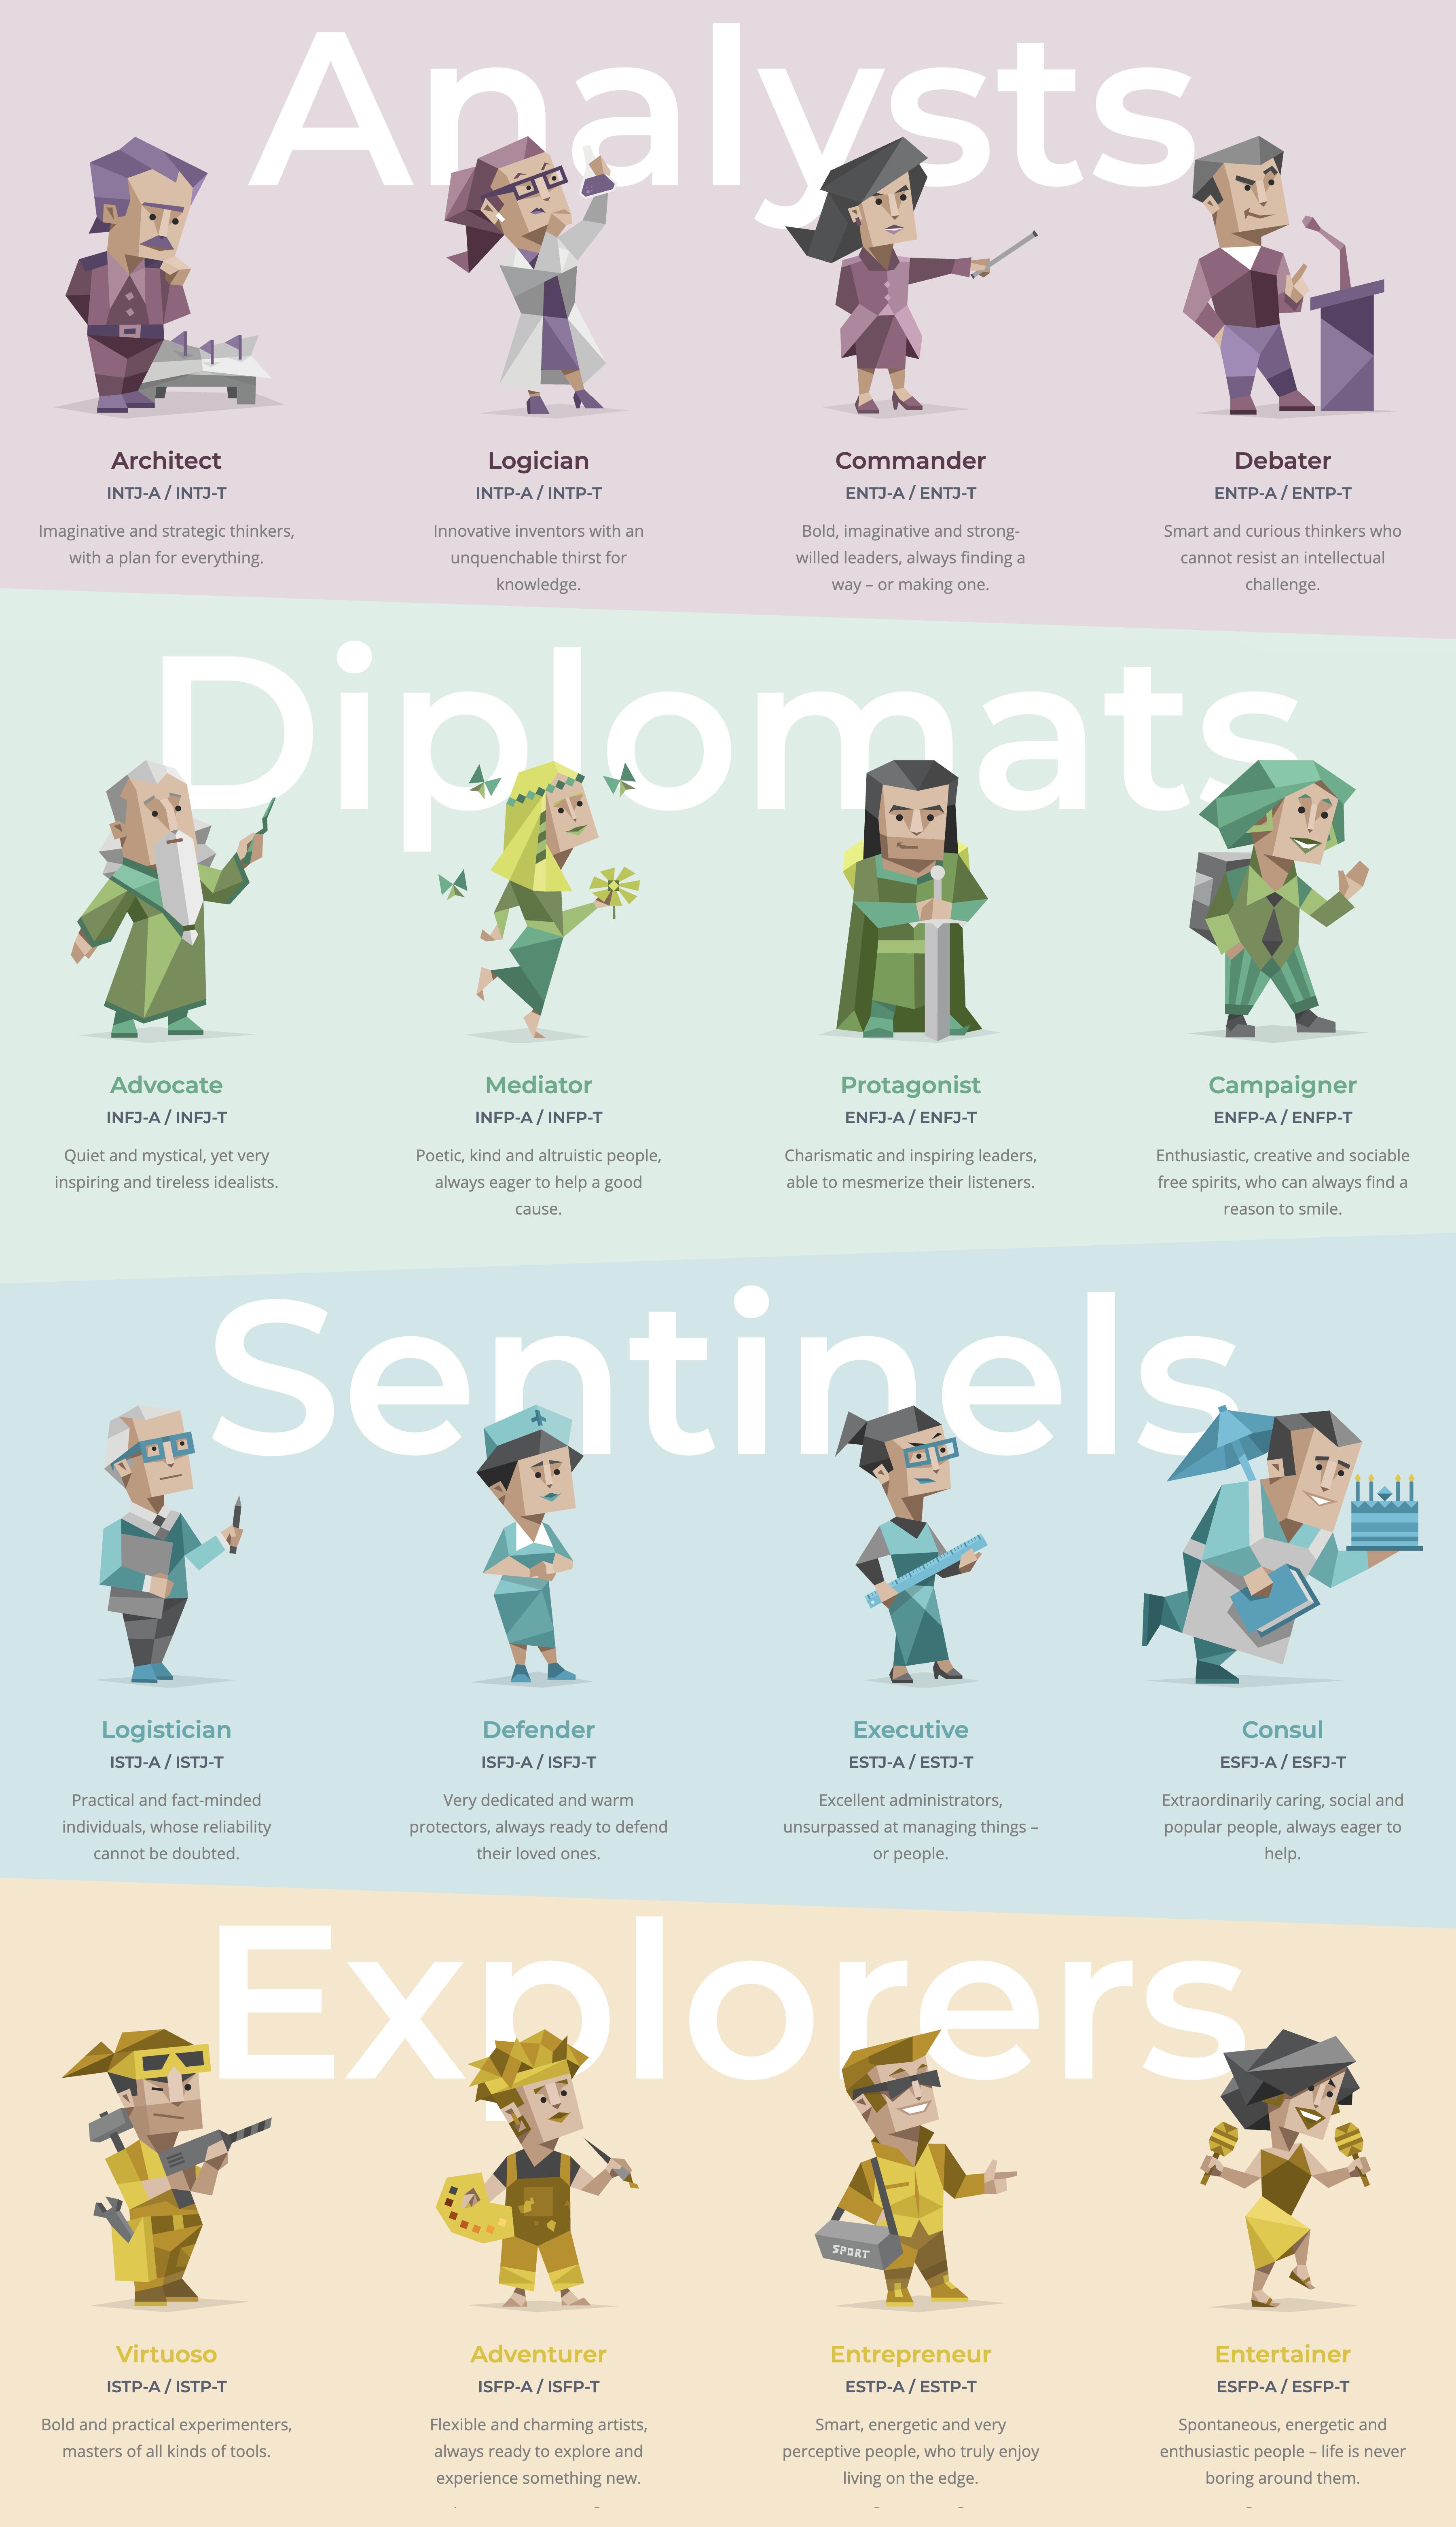 Personalities Types